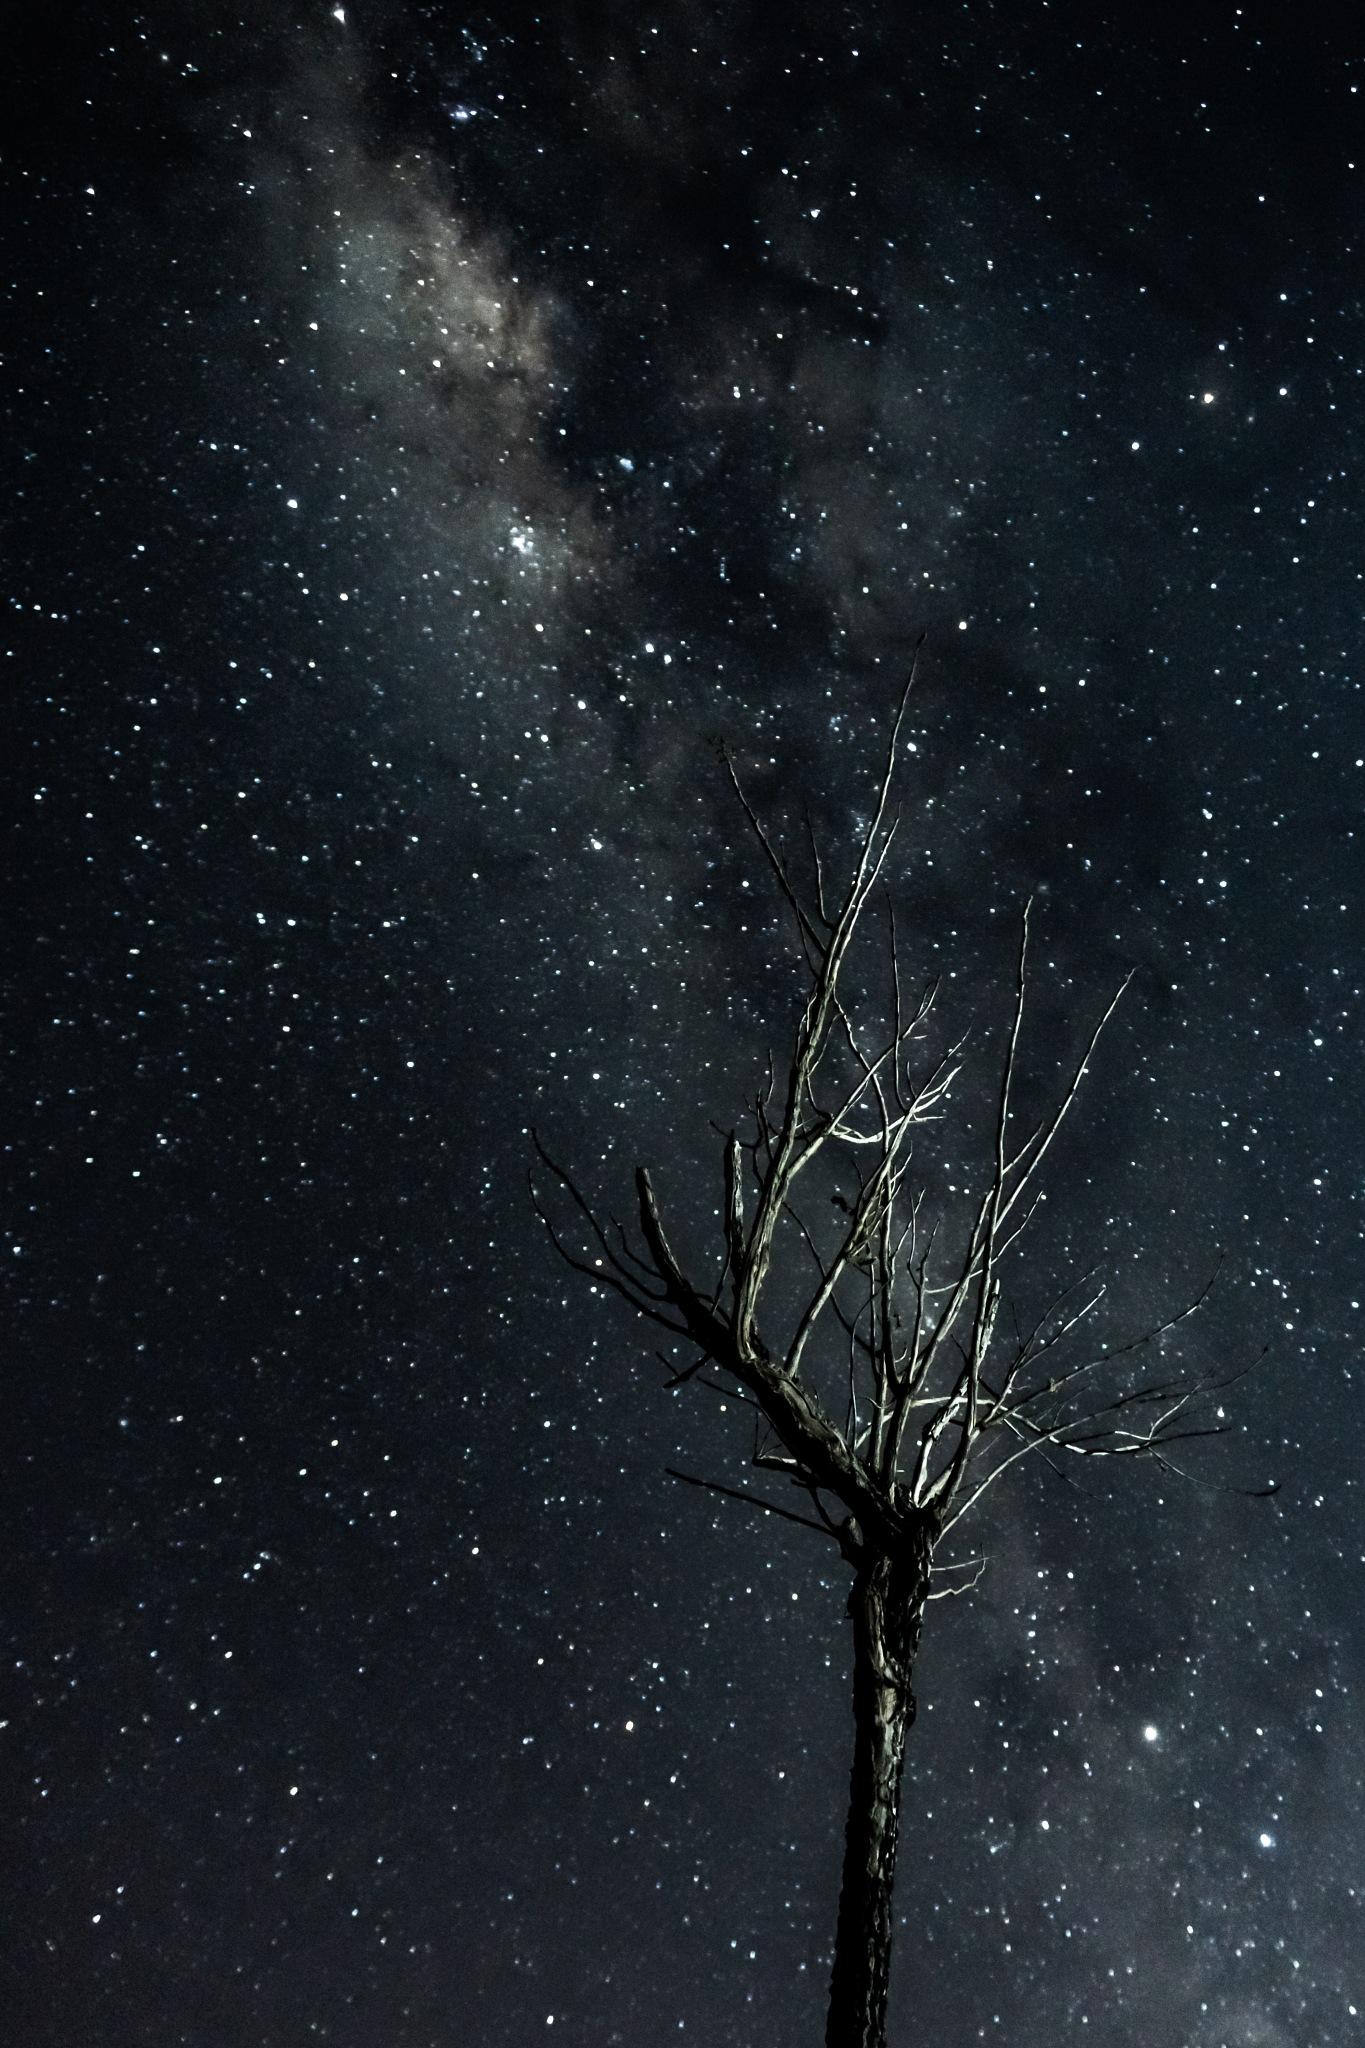 Nightsky by Giordano Rossi